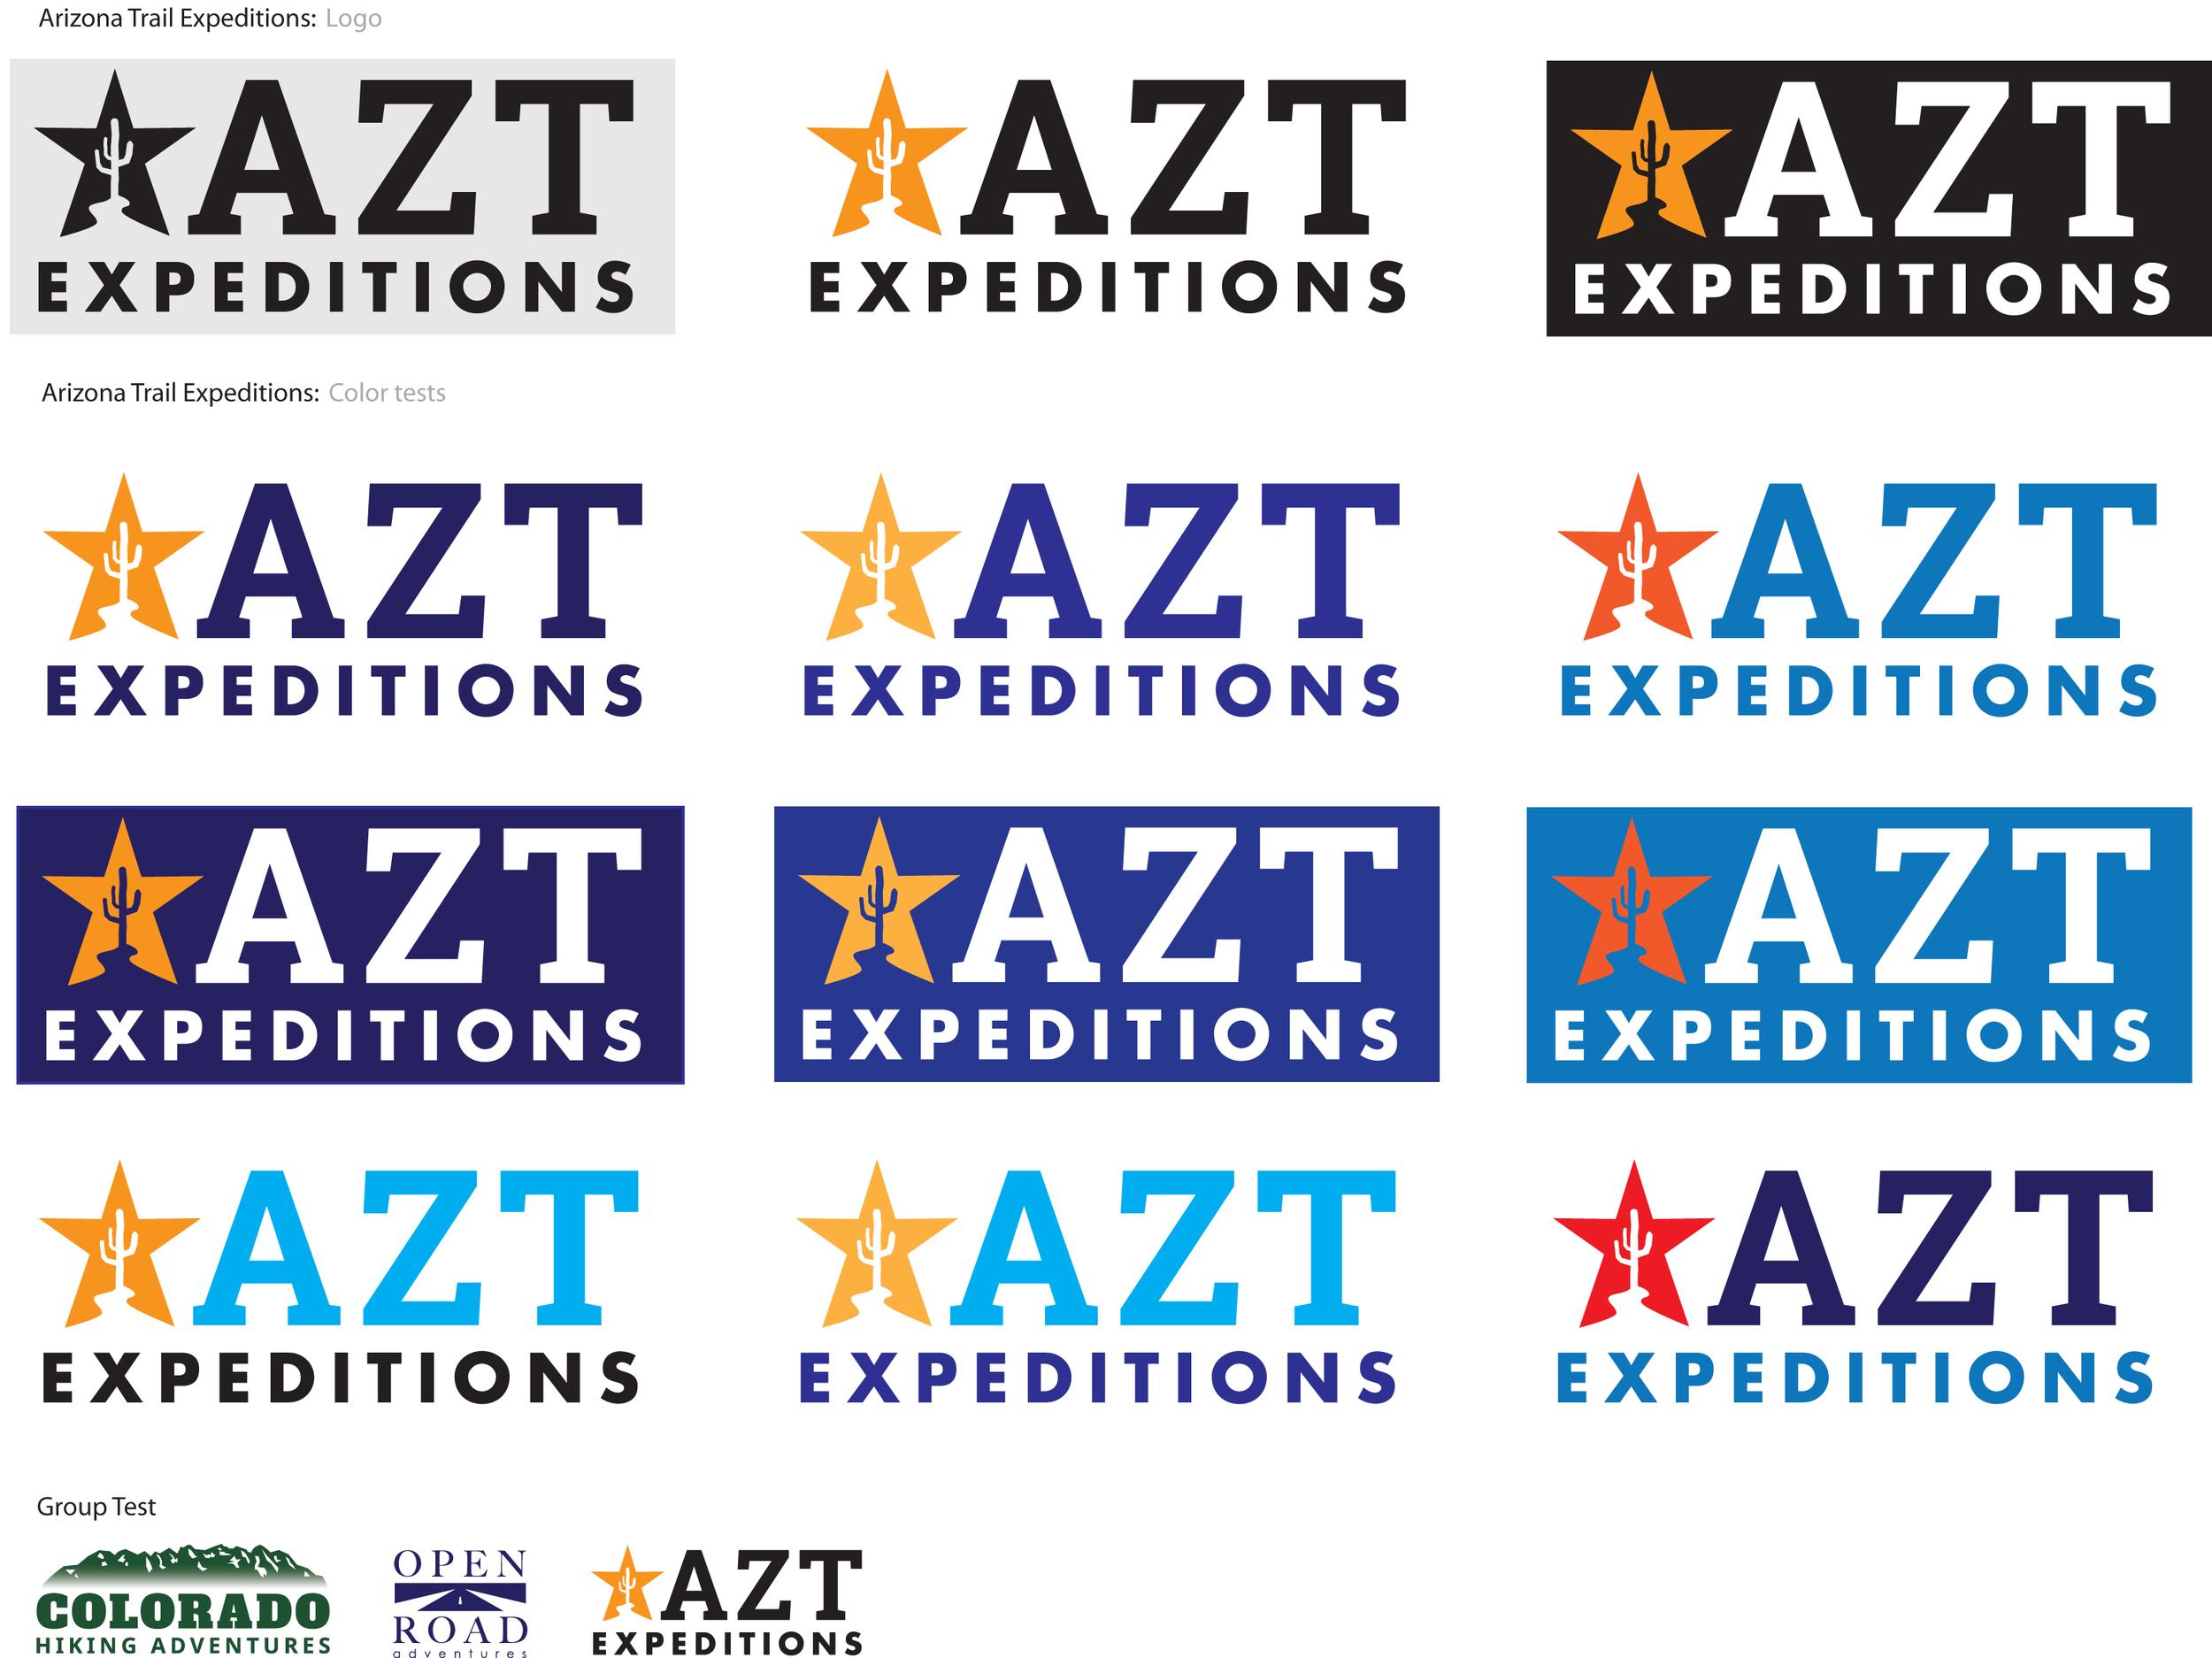 Arizona Trail Expeditions Logo Tests